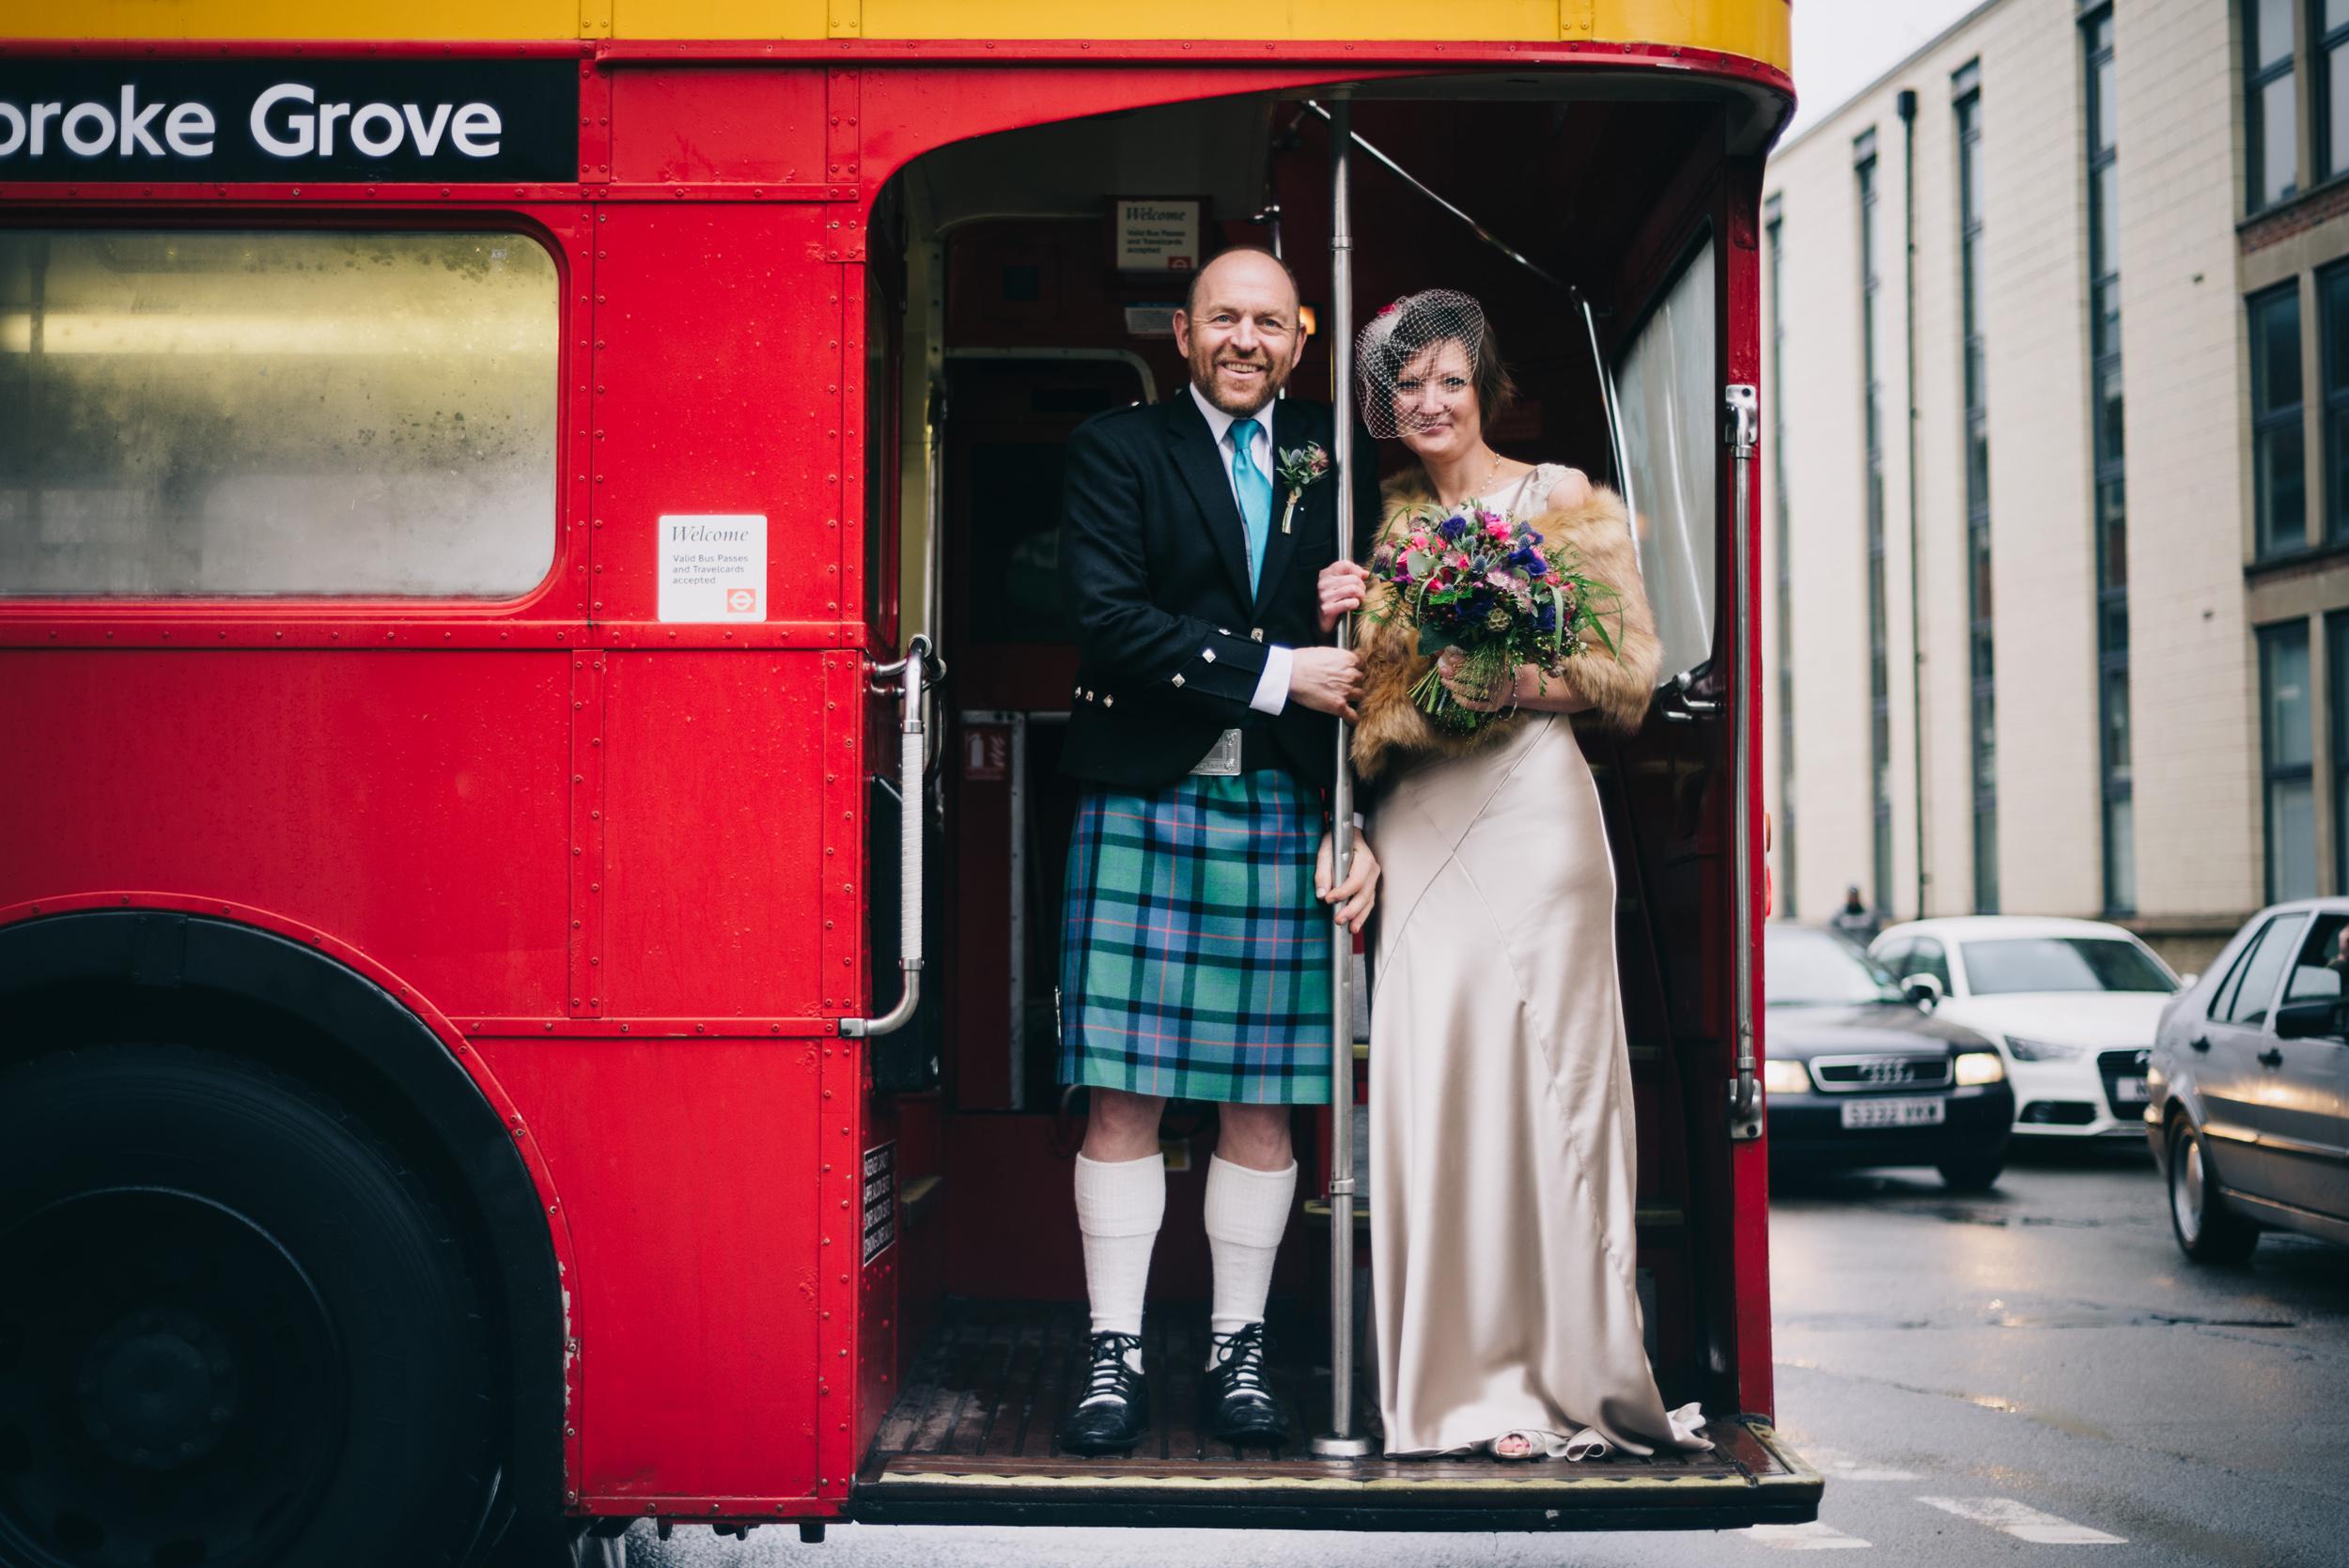 Alice-Bias-Cut-Silk-Wedding-Dress-Kate-Beaumont-Sheffield-Botanical-Gardens-by-Peakography-20.jpg